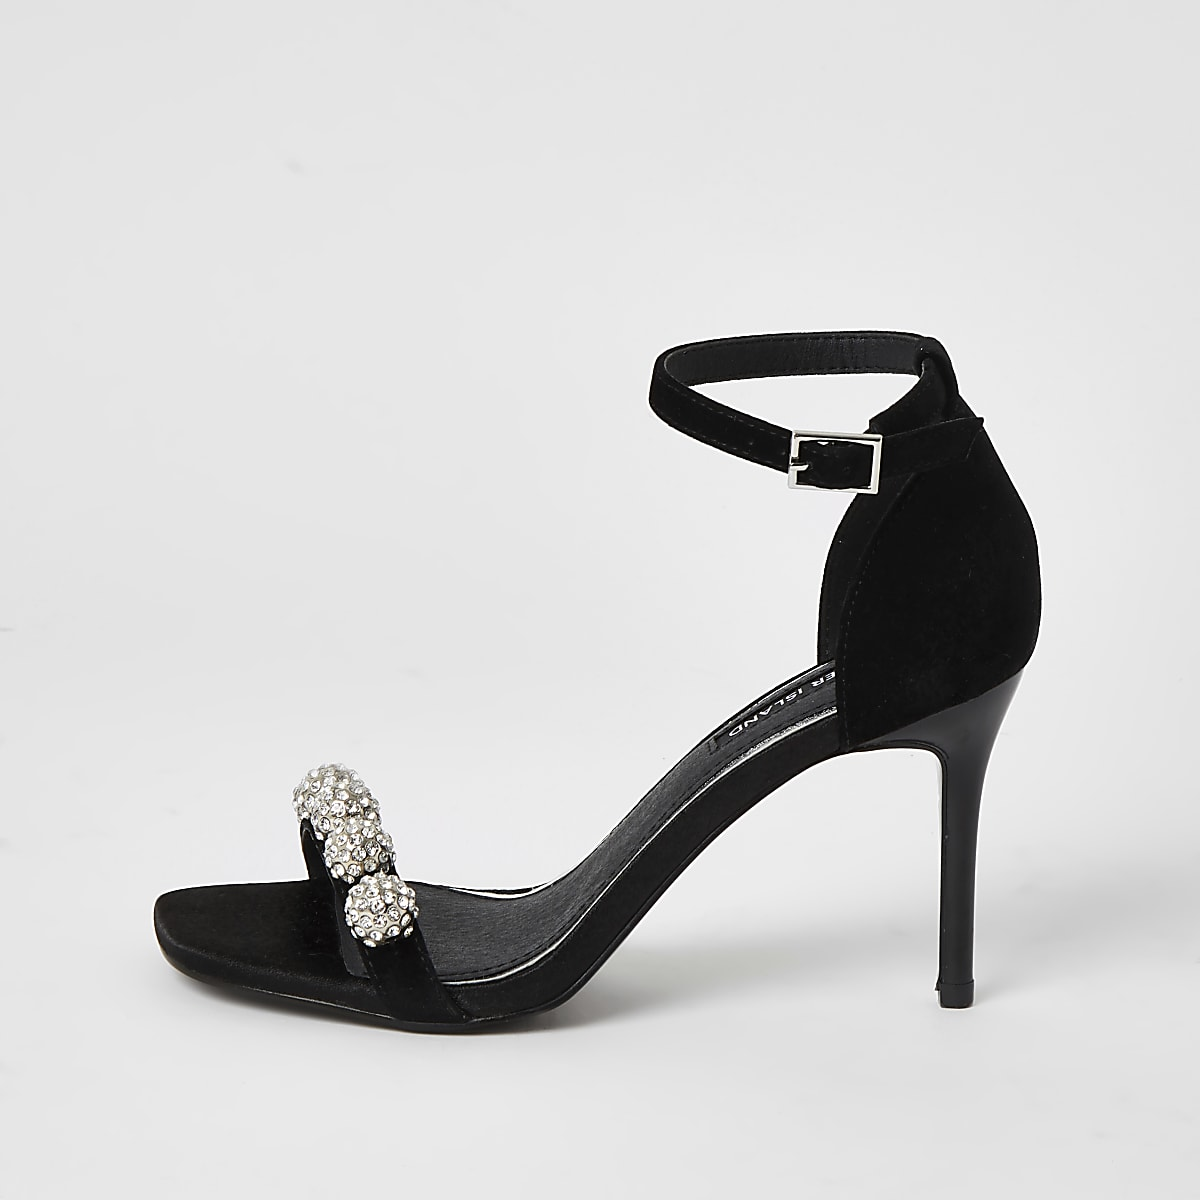 Black diamante embellished heeled sandal